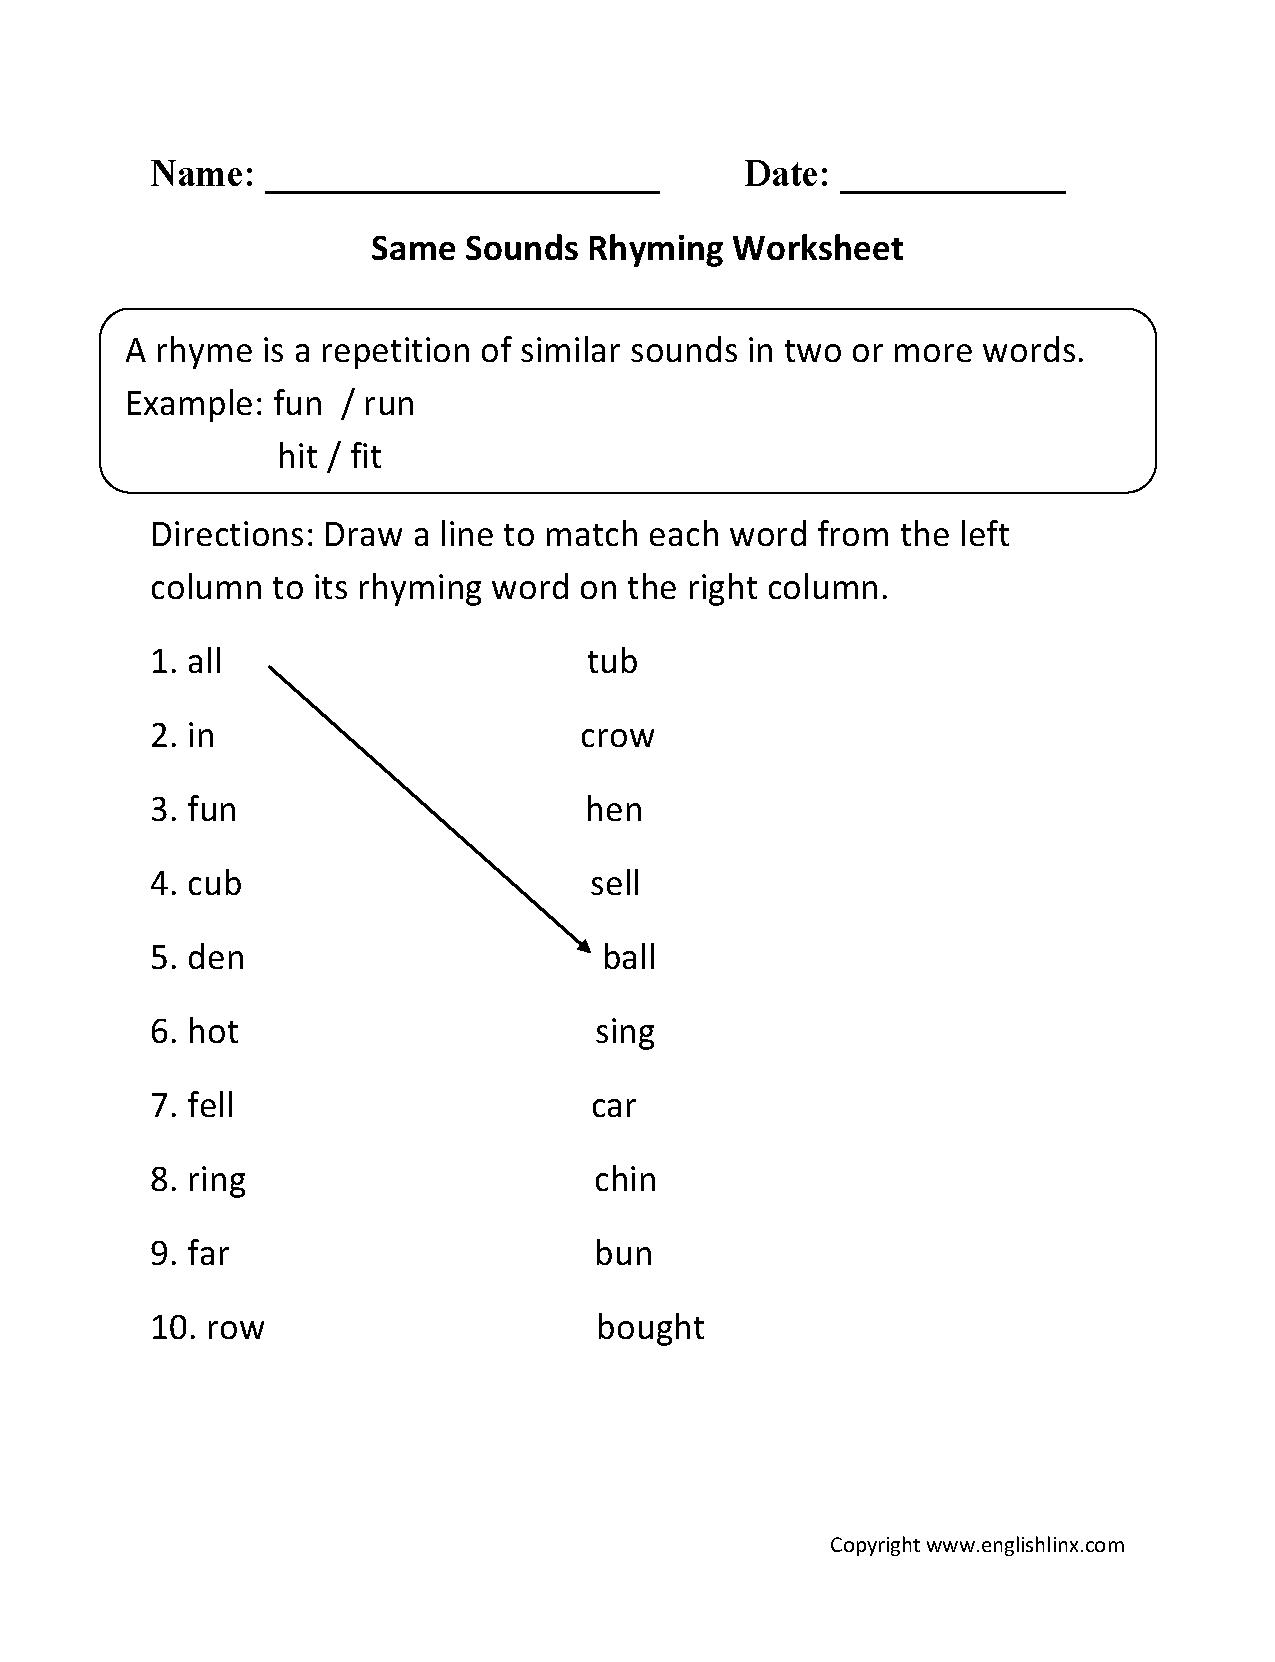 Same Sounds Rhyming Worksheets [ 1662 x 1275 Pixel ]